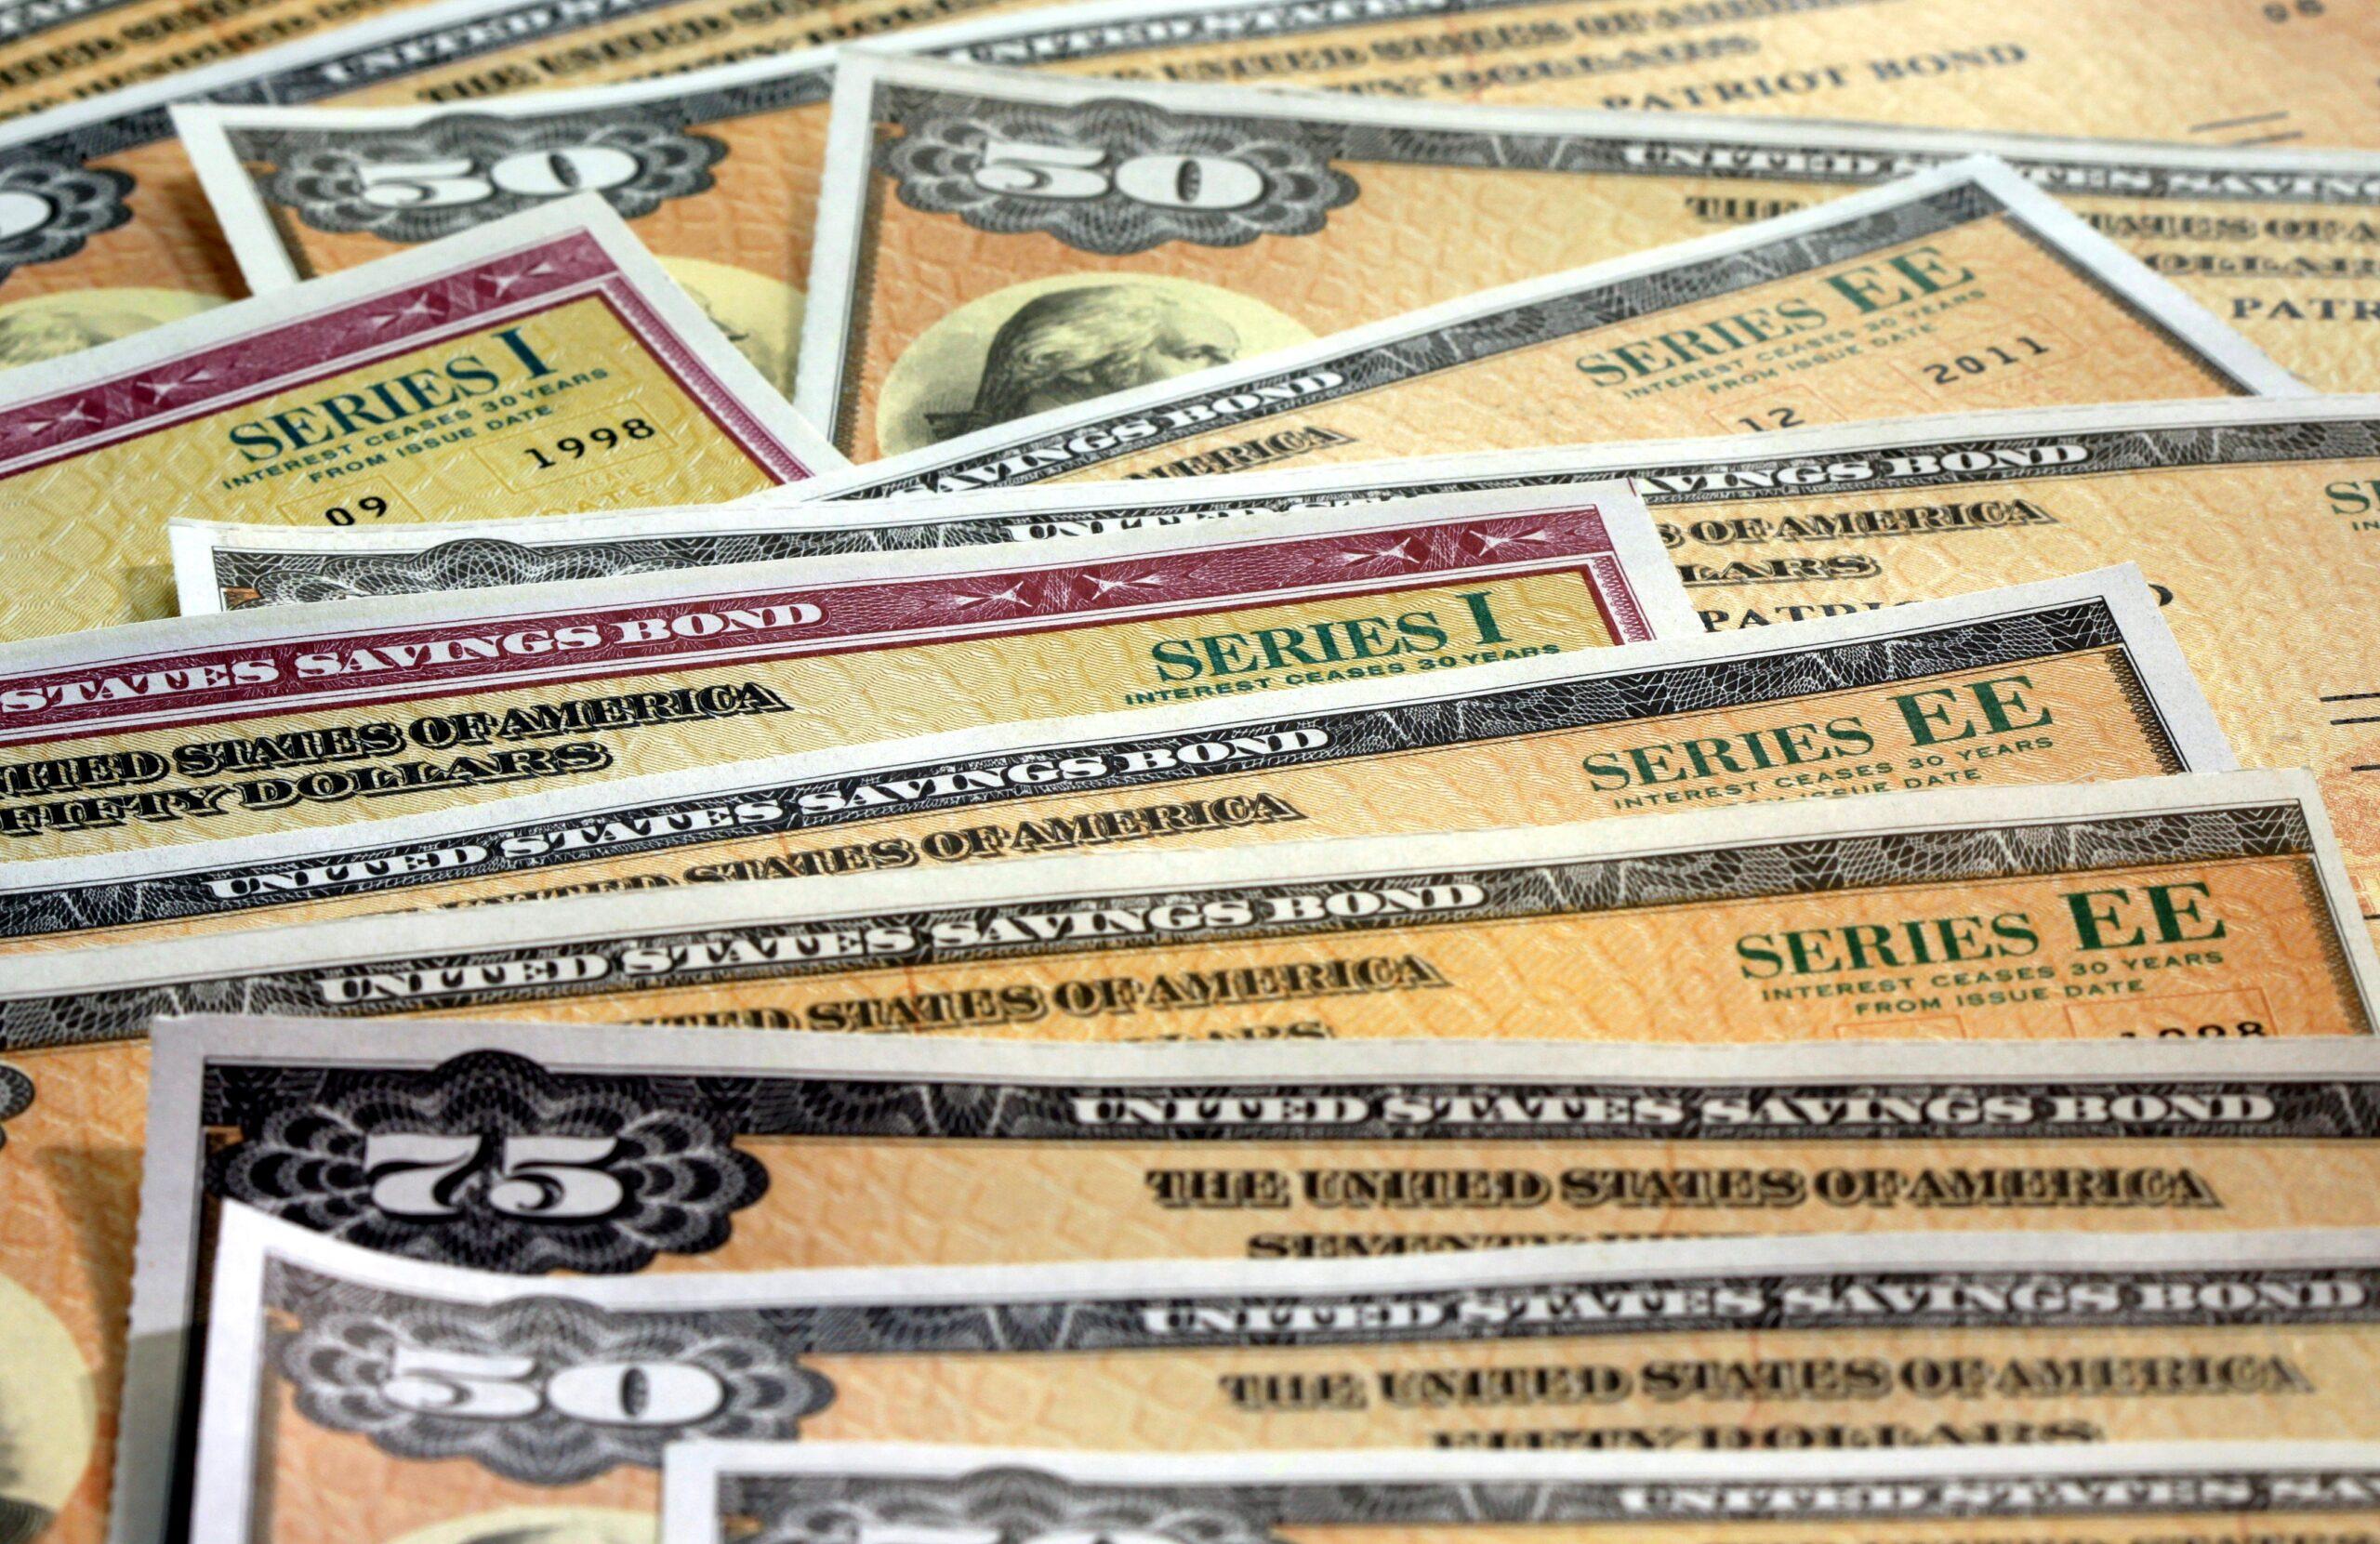 Series EE government bonds